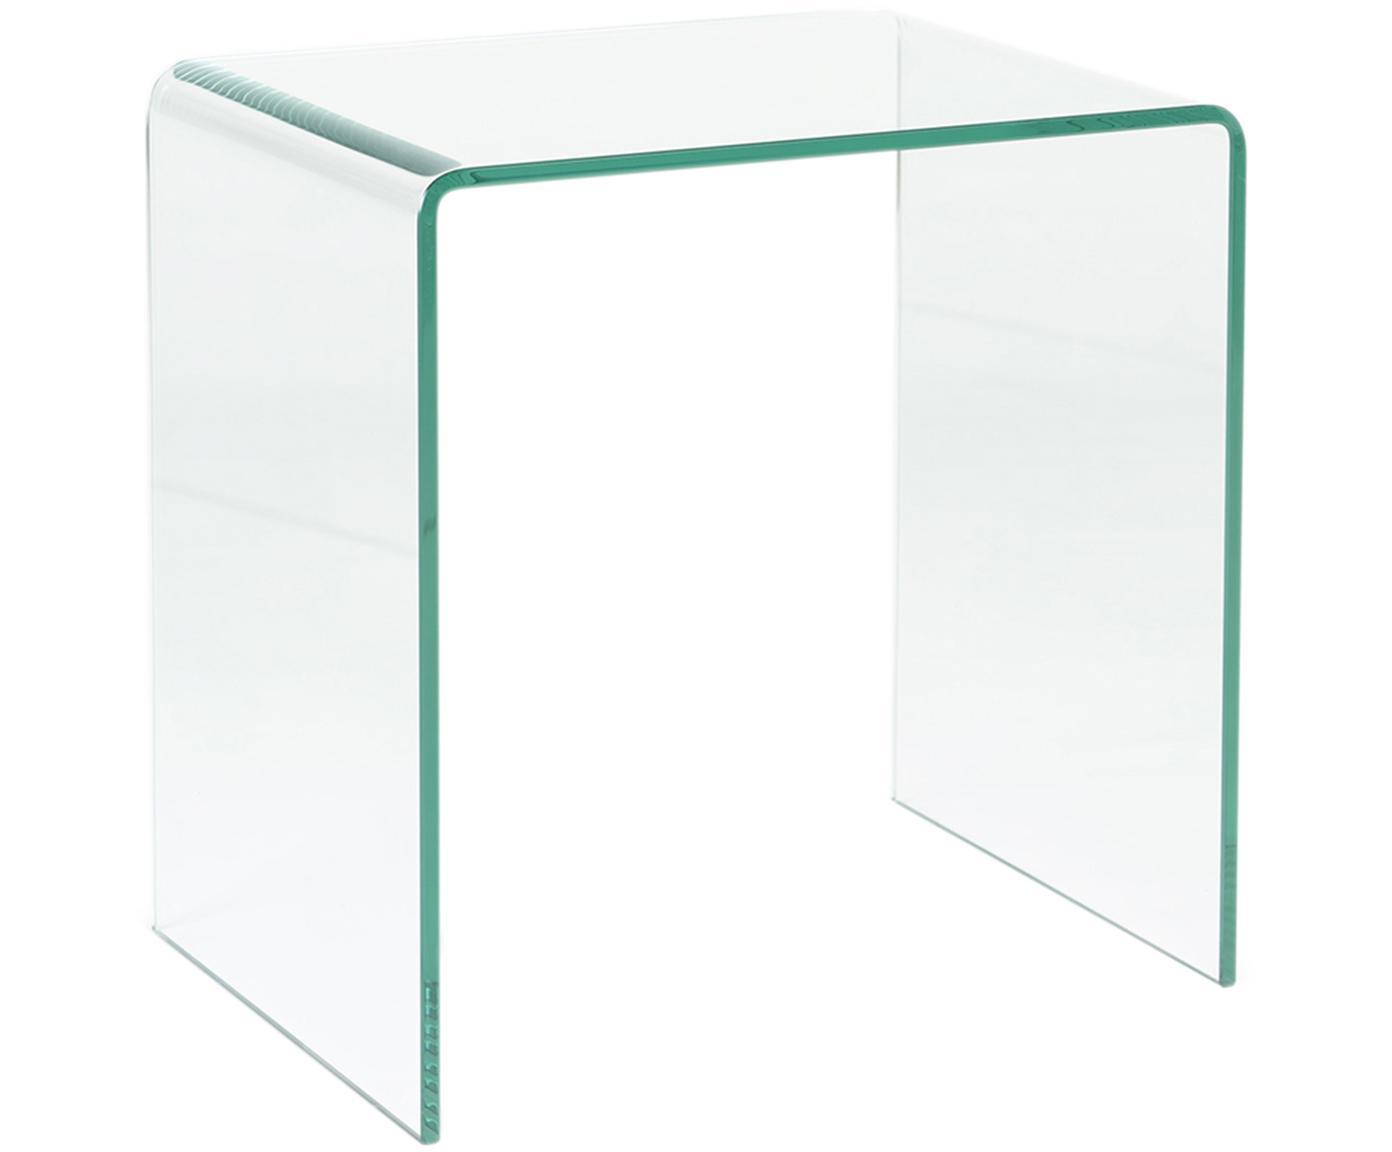 Mesilla de noche Double, Vidrio templado, Transparente, An 50 x Al 53 cm